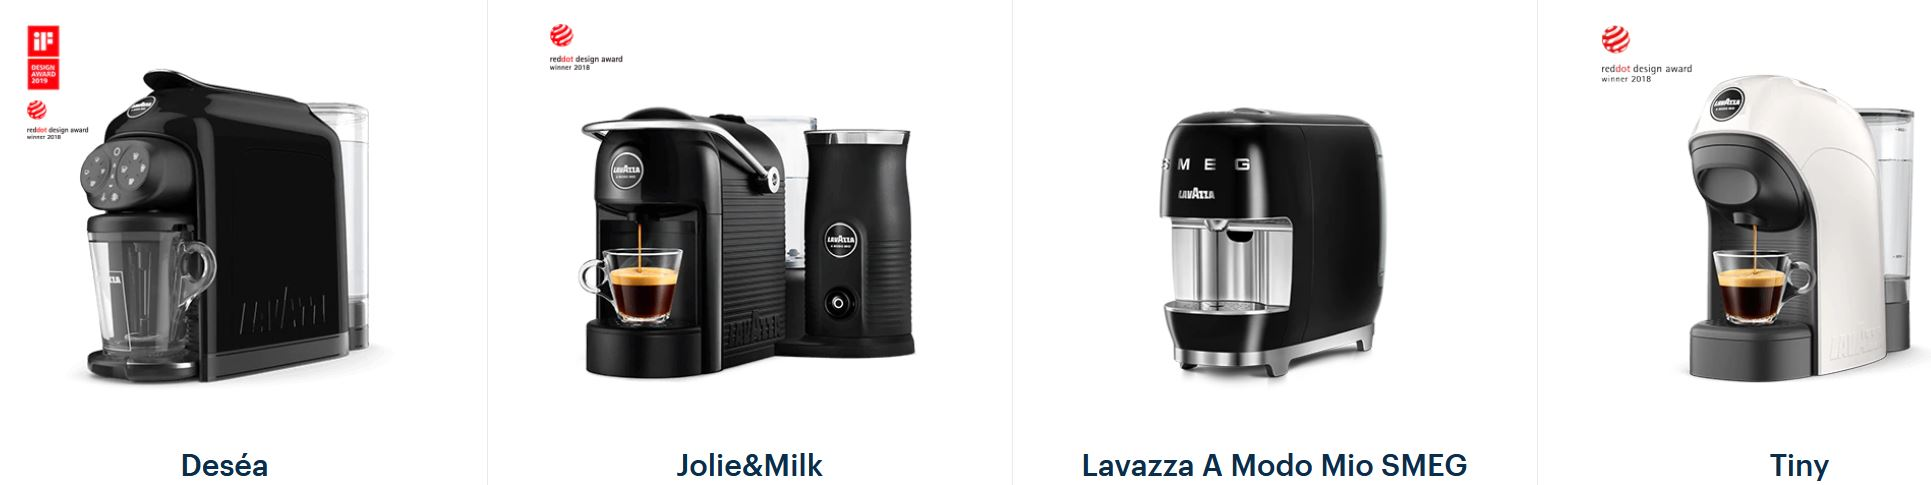 Lavazza Jolie and Milk